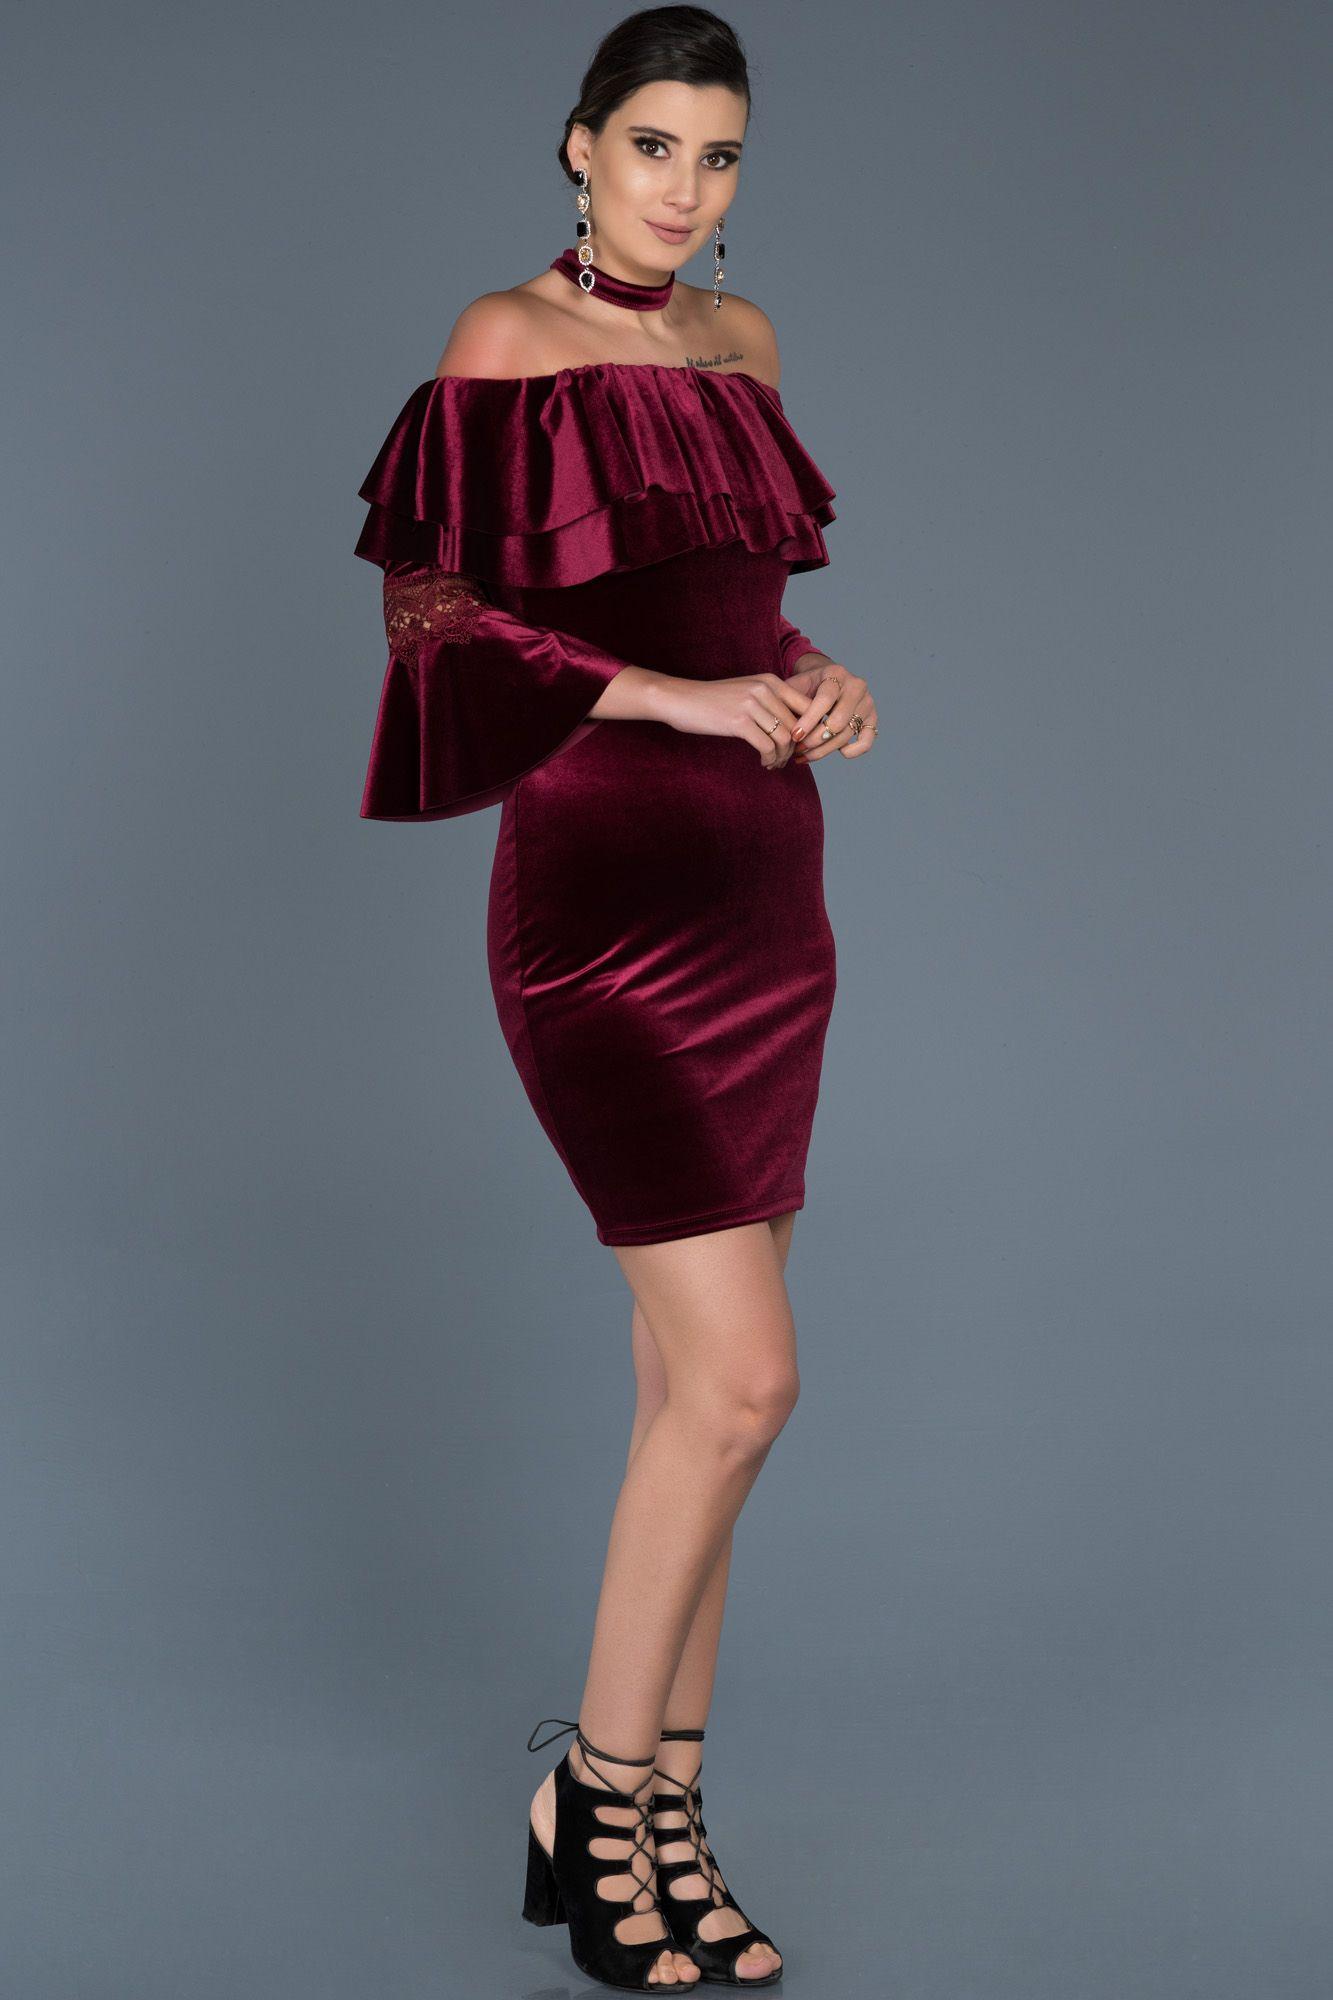 Bordo Madonna Yaka Kadife Elbise Abk329 Kisa Elbiseler Elbise The Dress